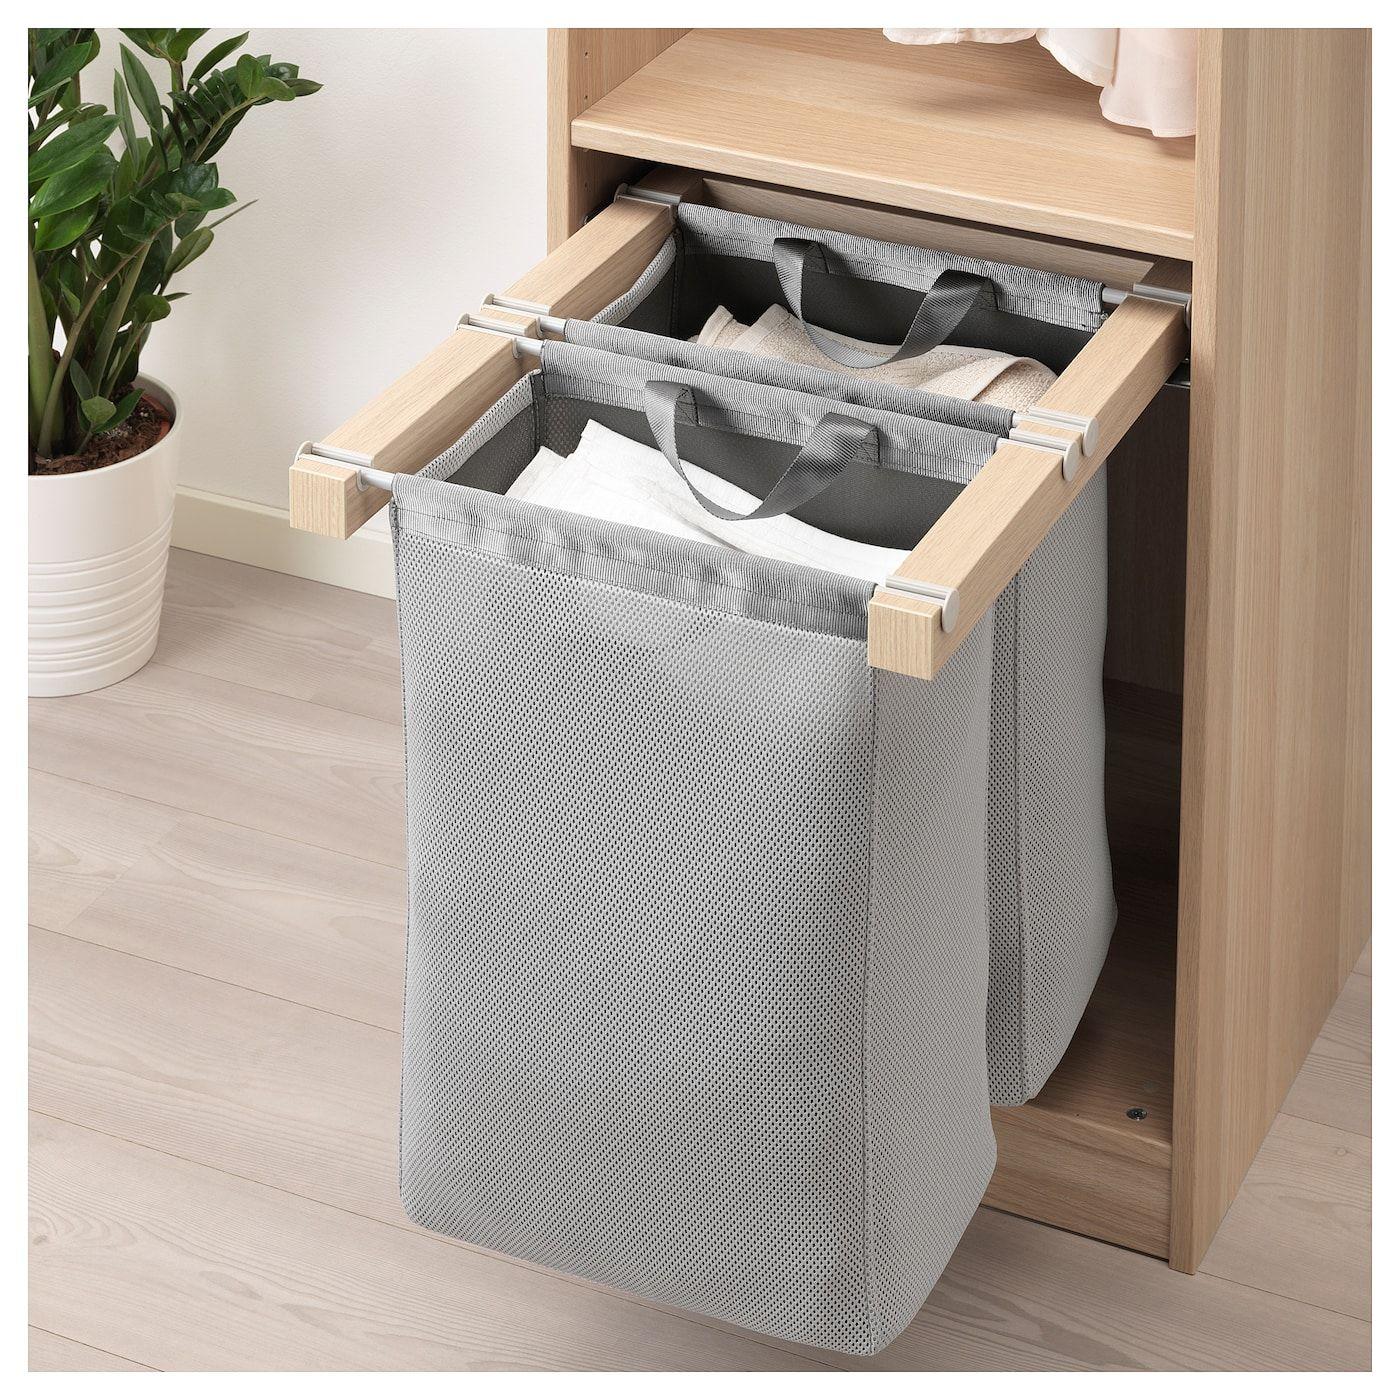 Ikea Komplement Uttrekkbar Oppbevaring Canasto Para Ropa Cestas De Ropa Mueble Para Lavadero